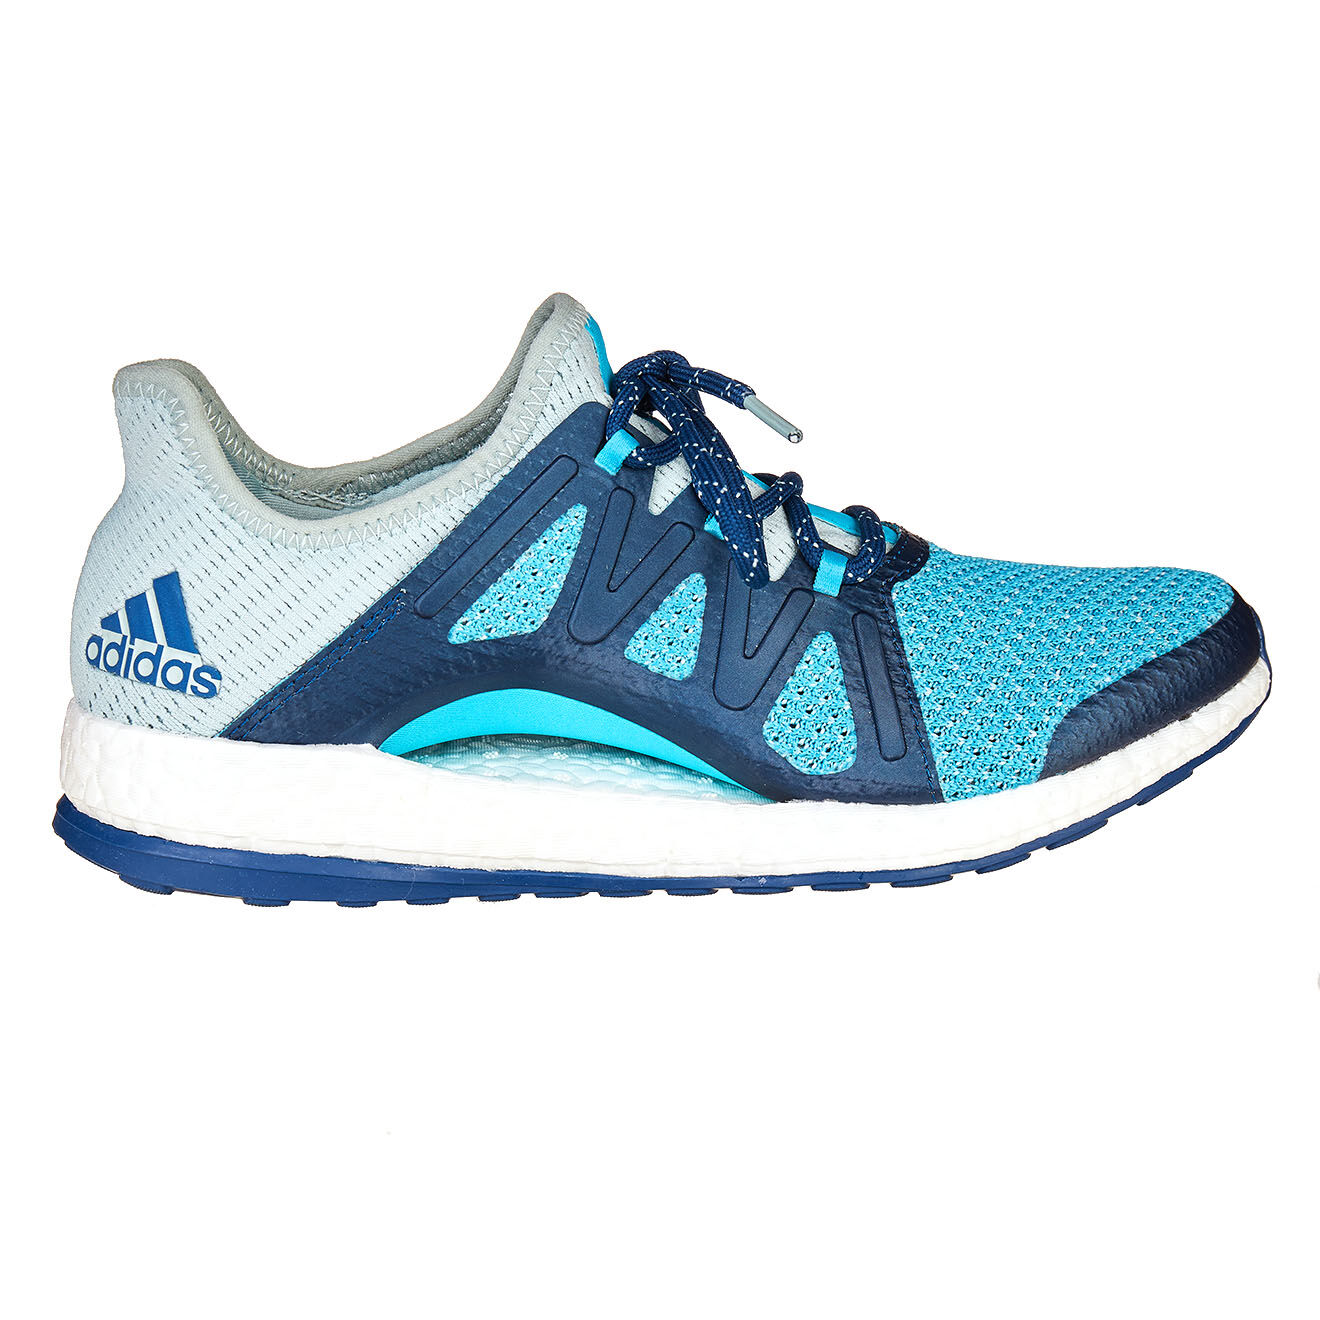 Baskets running Pureboost Xpose - Adidas - Modalova